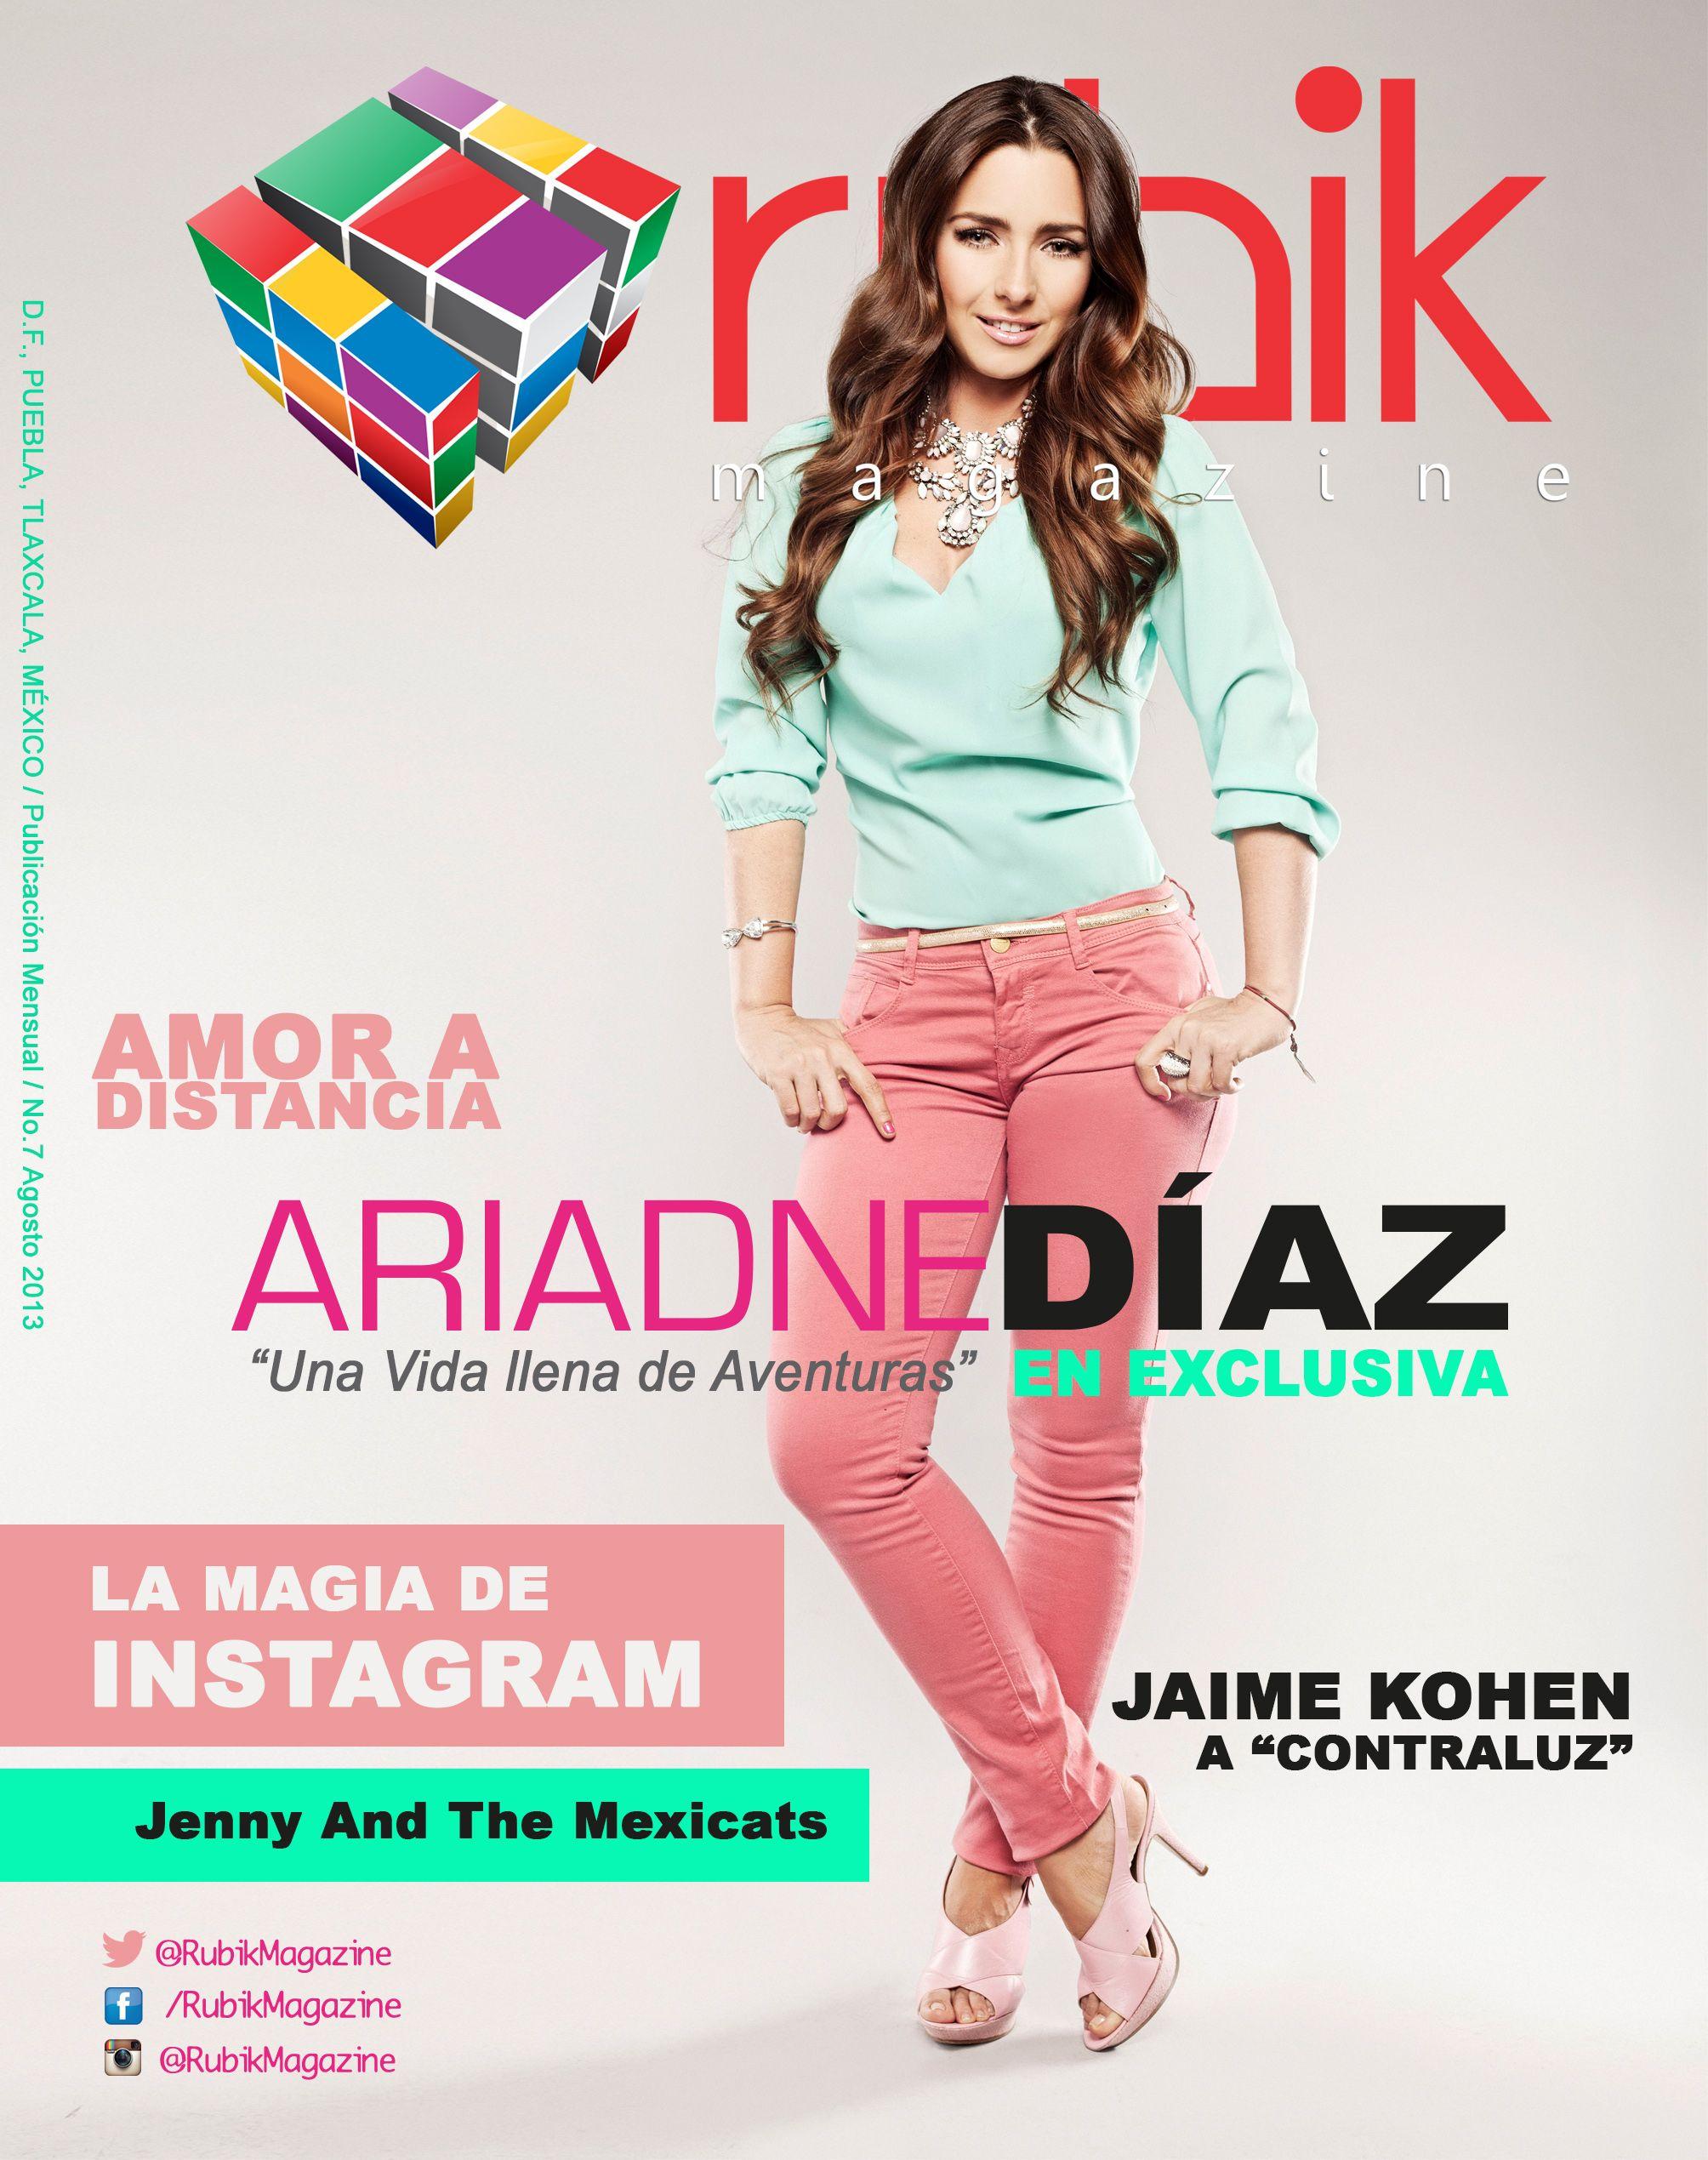 Ariadne Diaz Pics ariadne diaz | rubik magazine | ariadne diaz, clothes, magazine